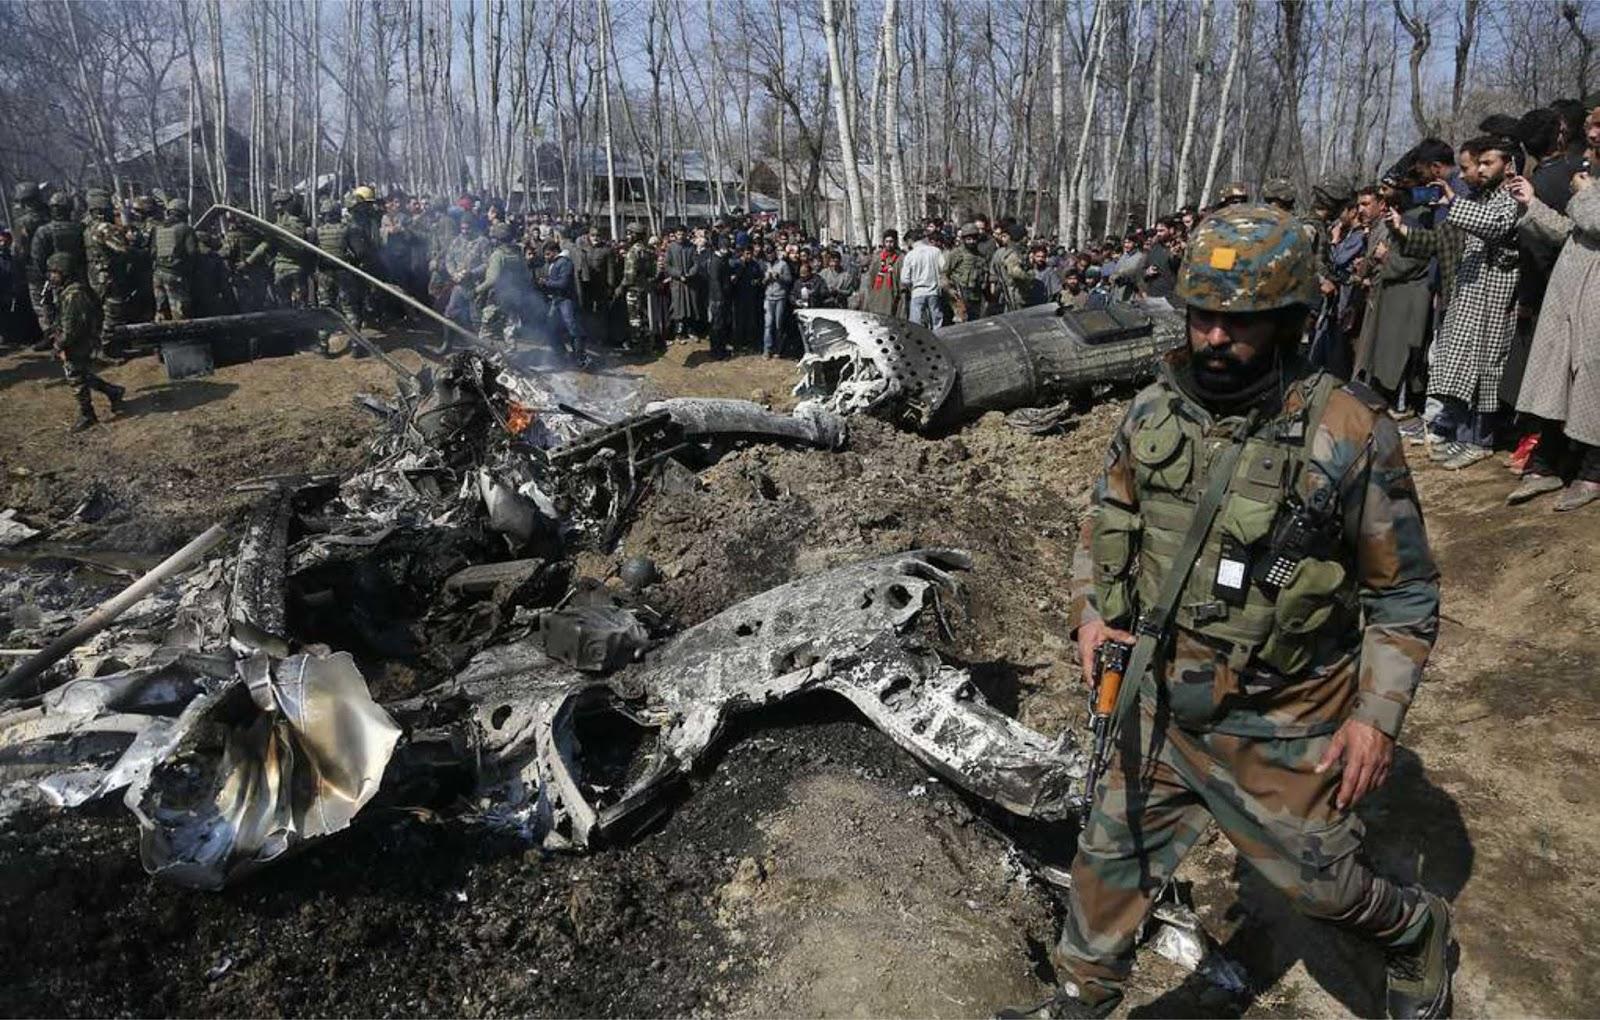 India mengatakan kehilangan pesawat tempur MiG-21 beserta pilotnya